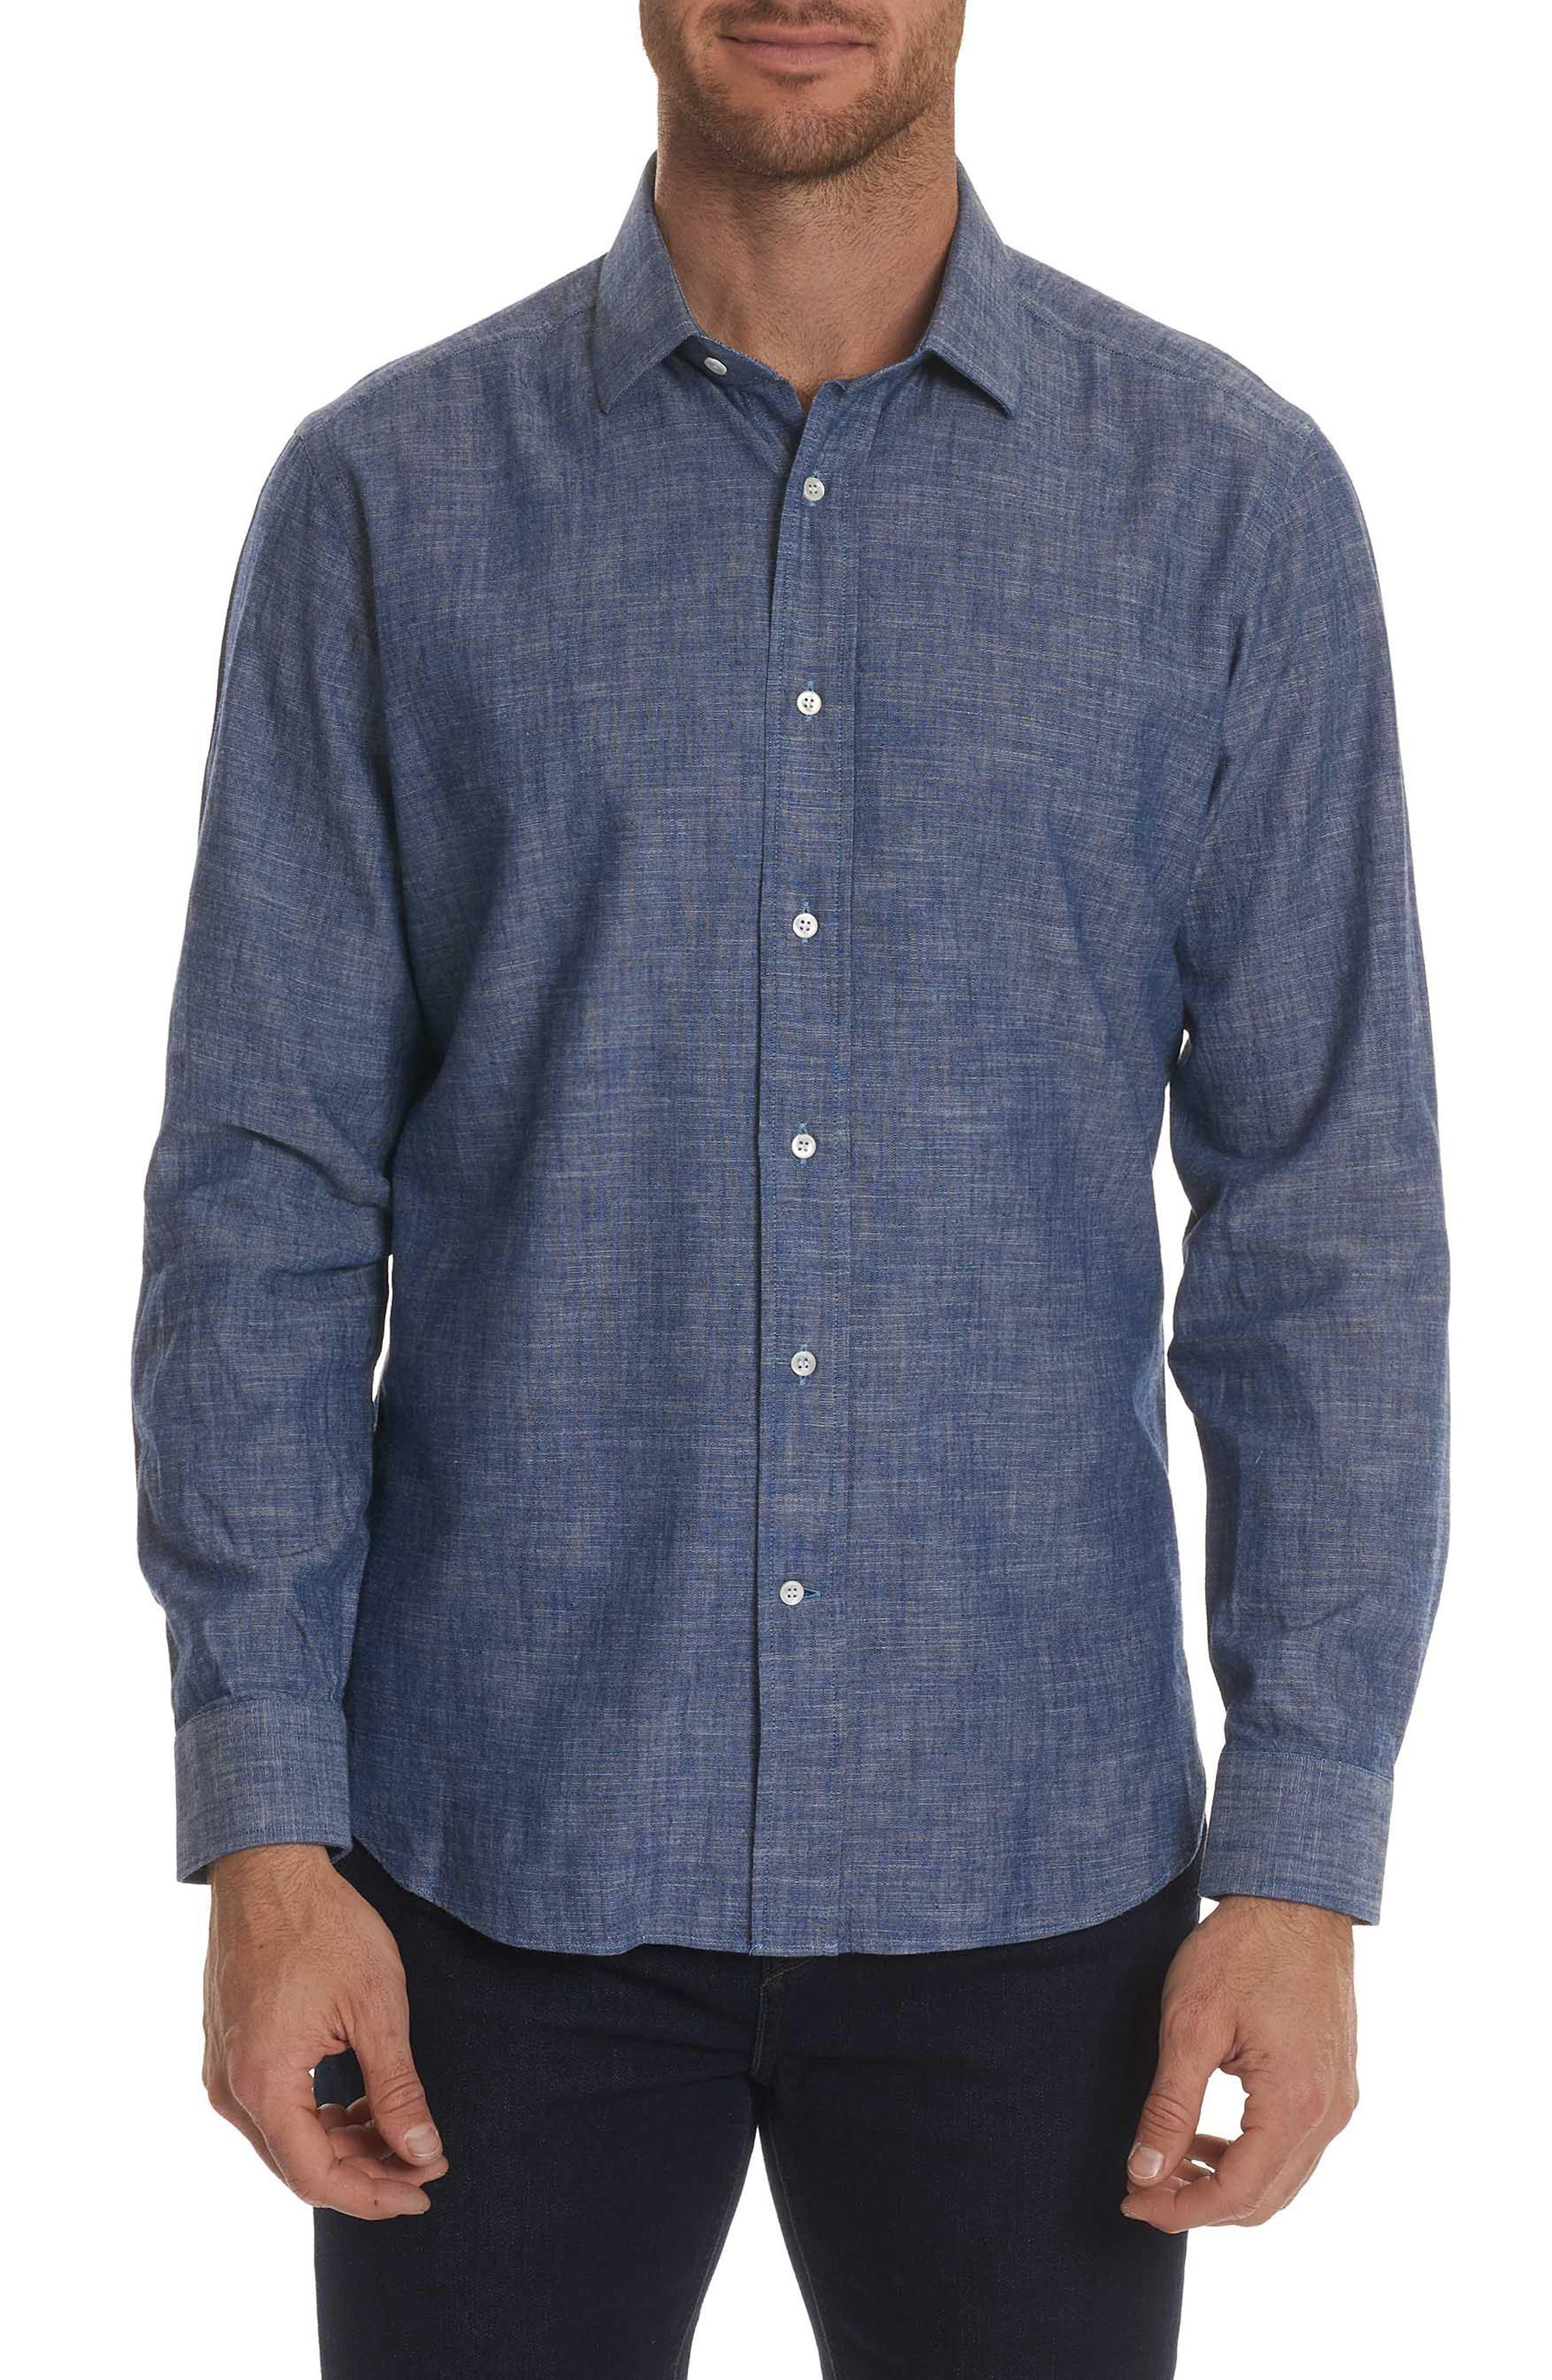 Peperill Regular Fit Sport Shirt,                         Main,                         color, Denim